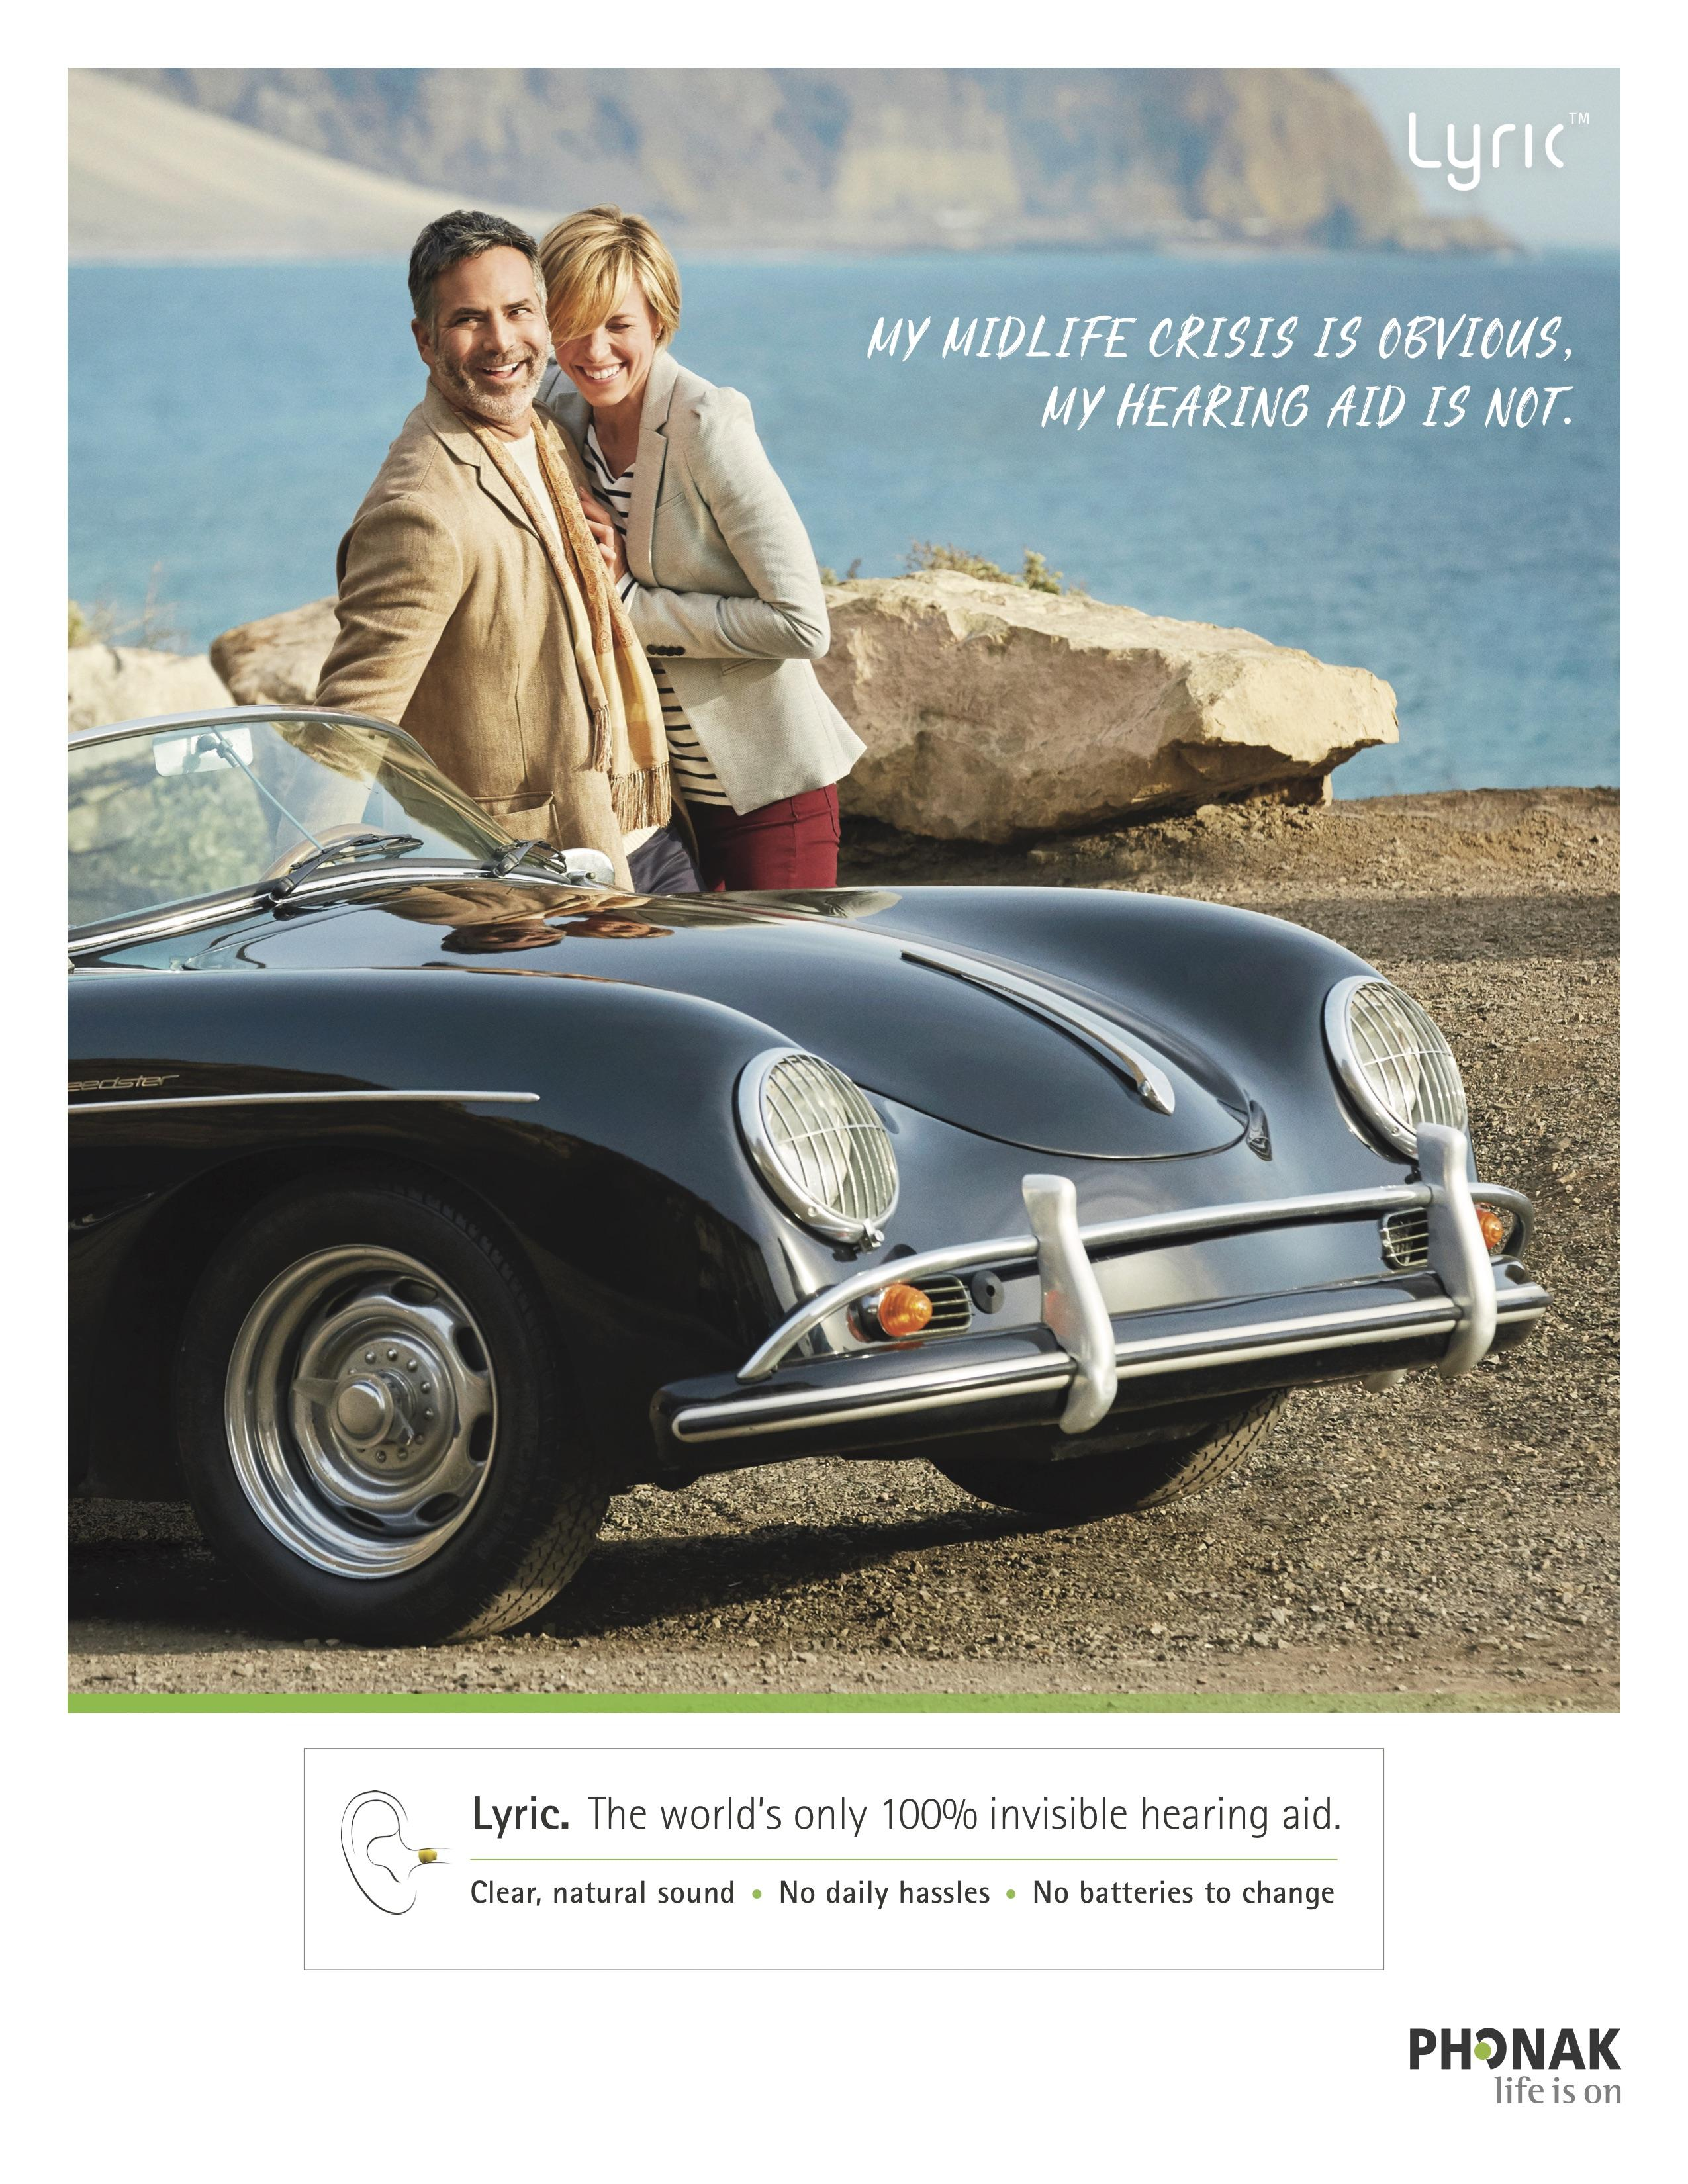 Phonak Print Ad - Midlife crisis